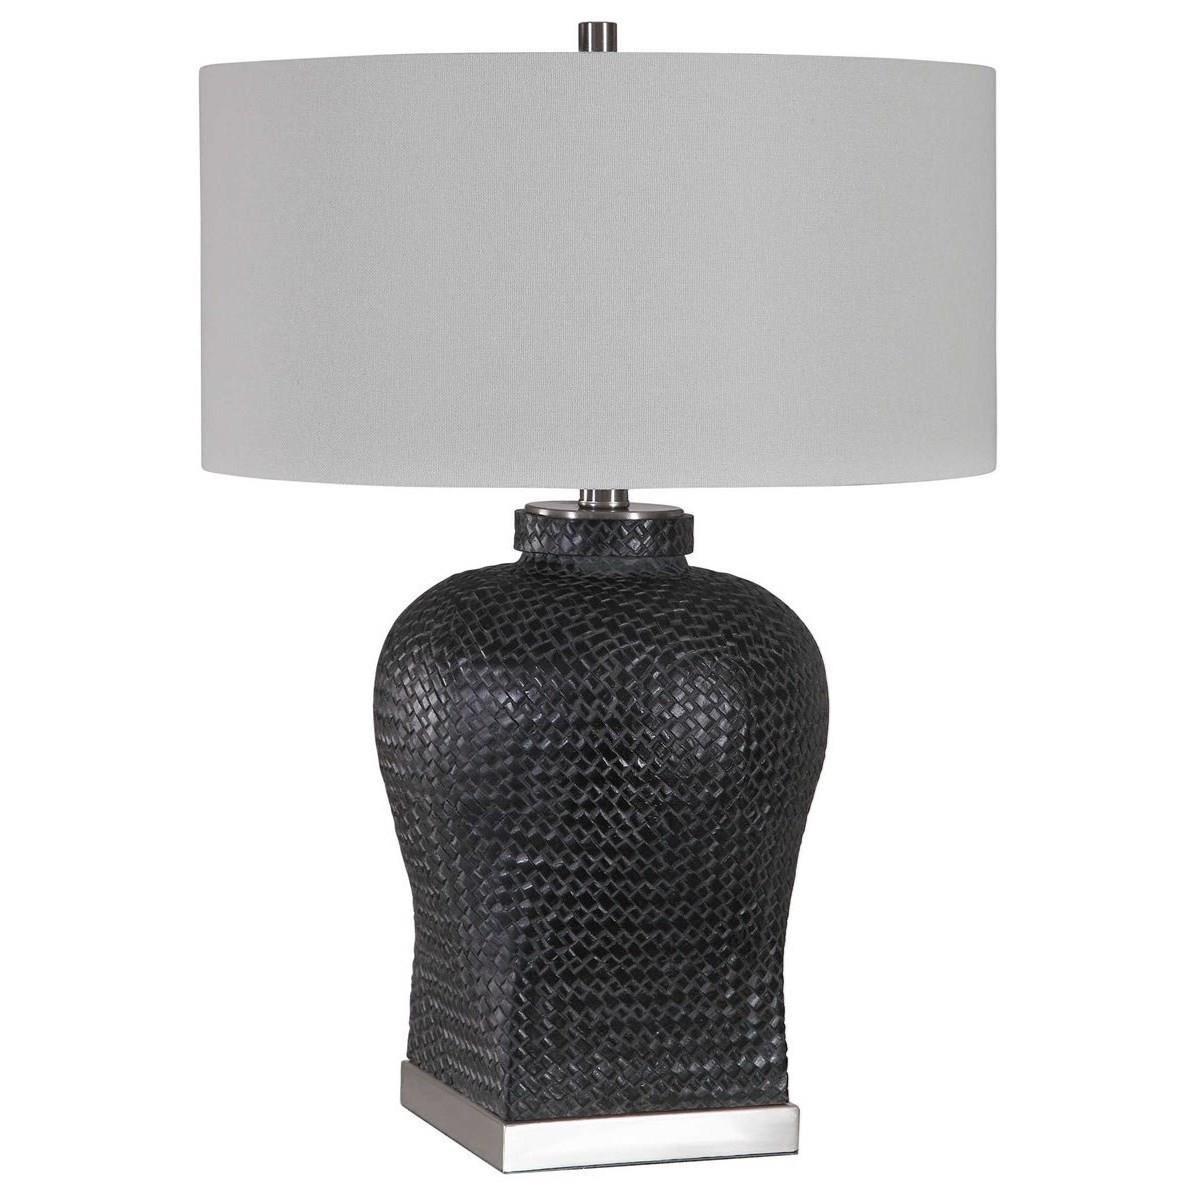 Akello Weave Texture Table Lamp